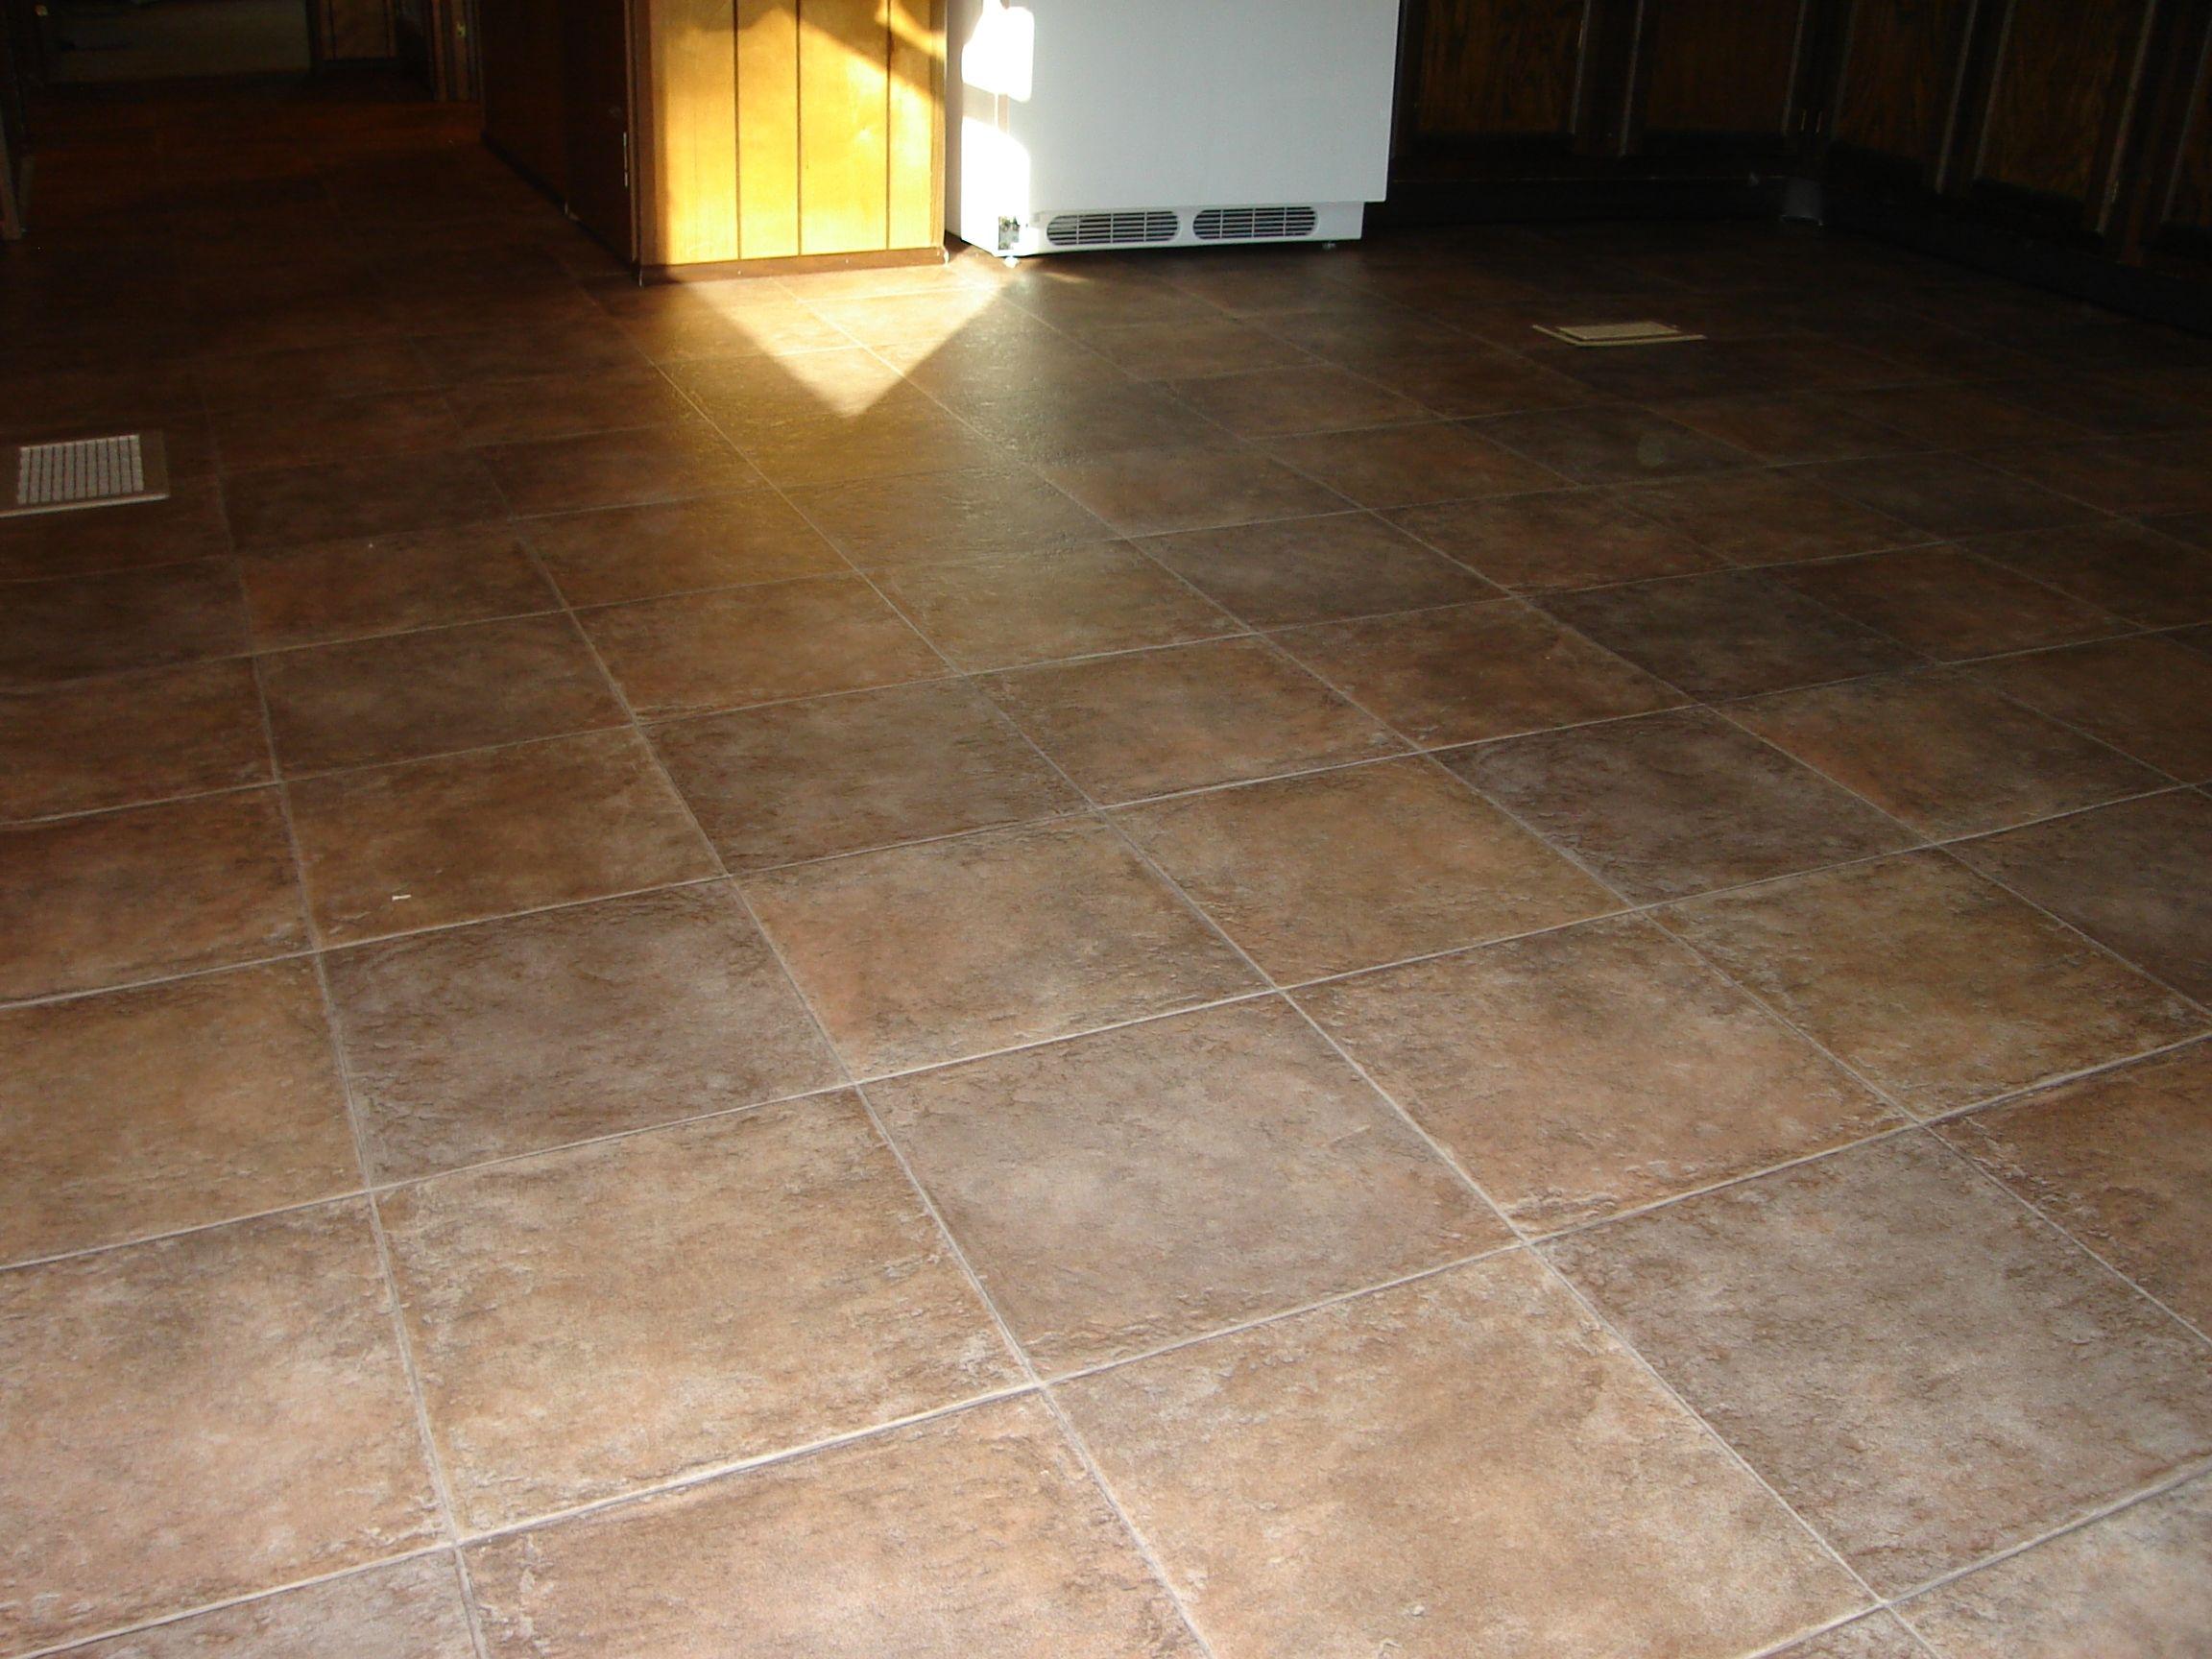 Interlocking vinyl floor tiles kitchen httpnextsoft21 interlocking vinyl floor tiles kitchen doublecrazyfo Images